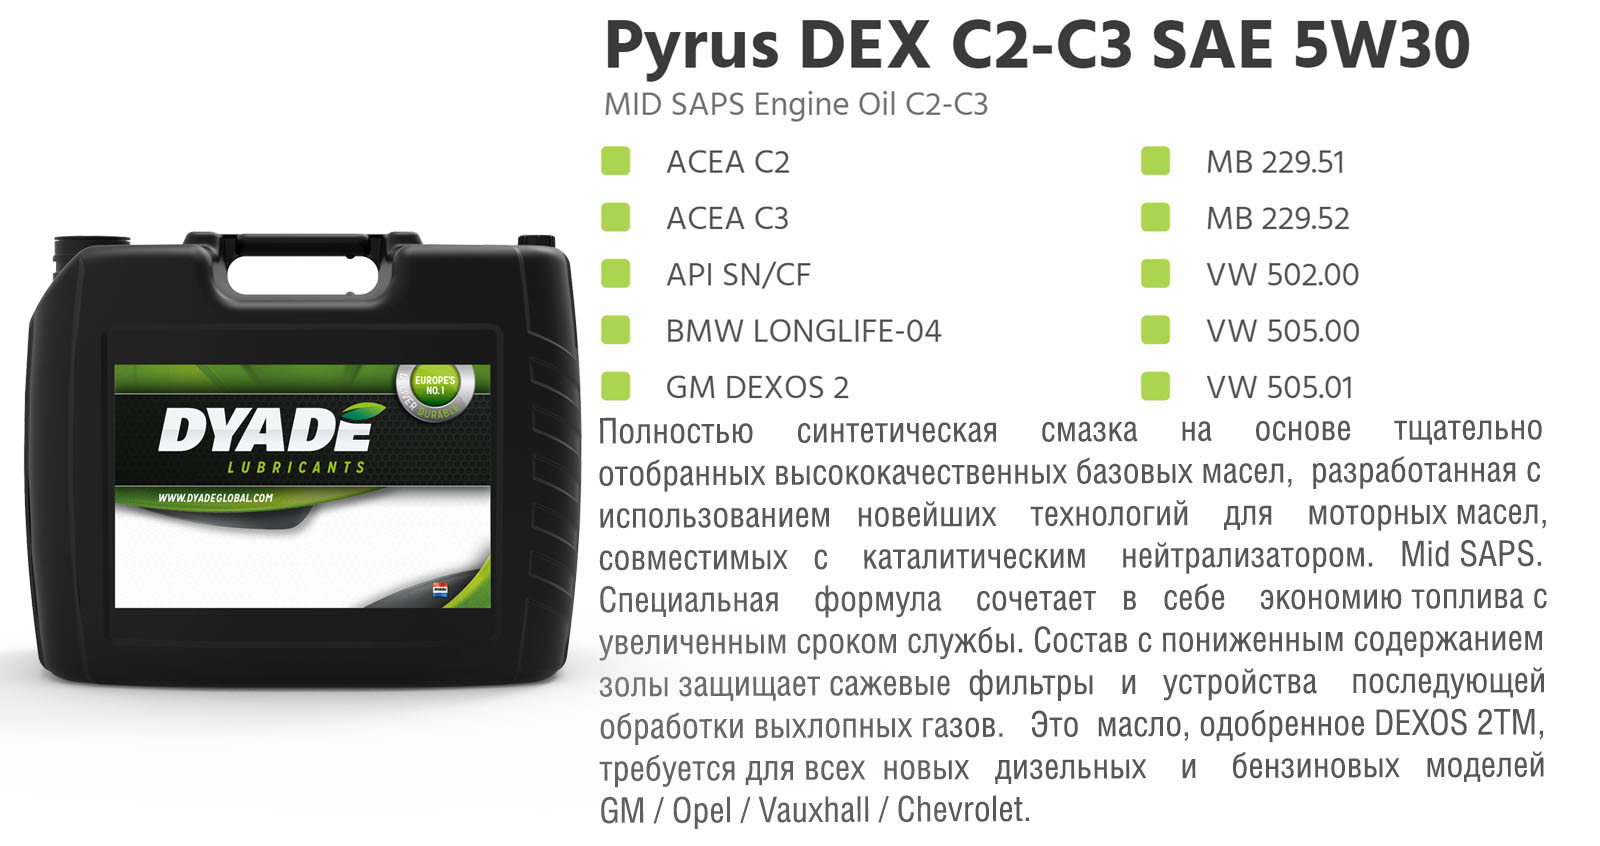 Масло моторное Pyrus DEX C2-C3 SAE 5W30 (20L) 574297 dyadelubricants